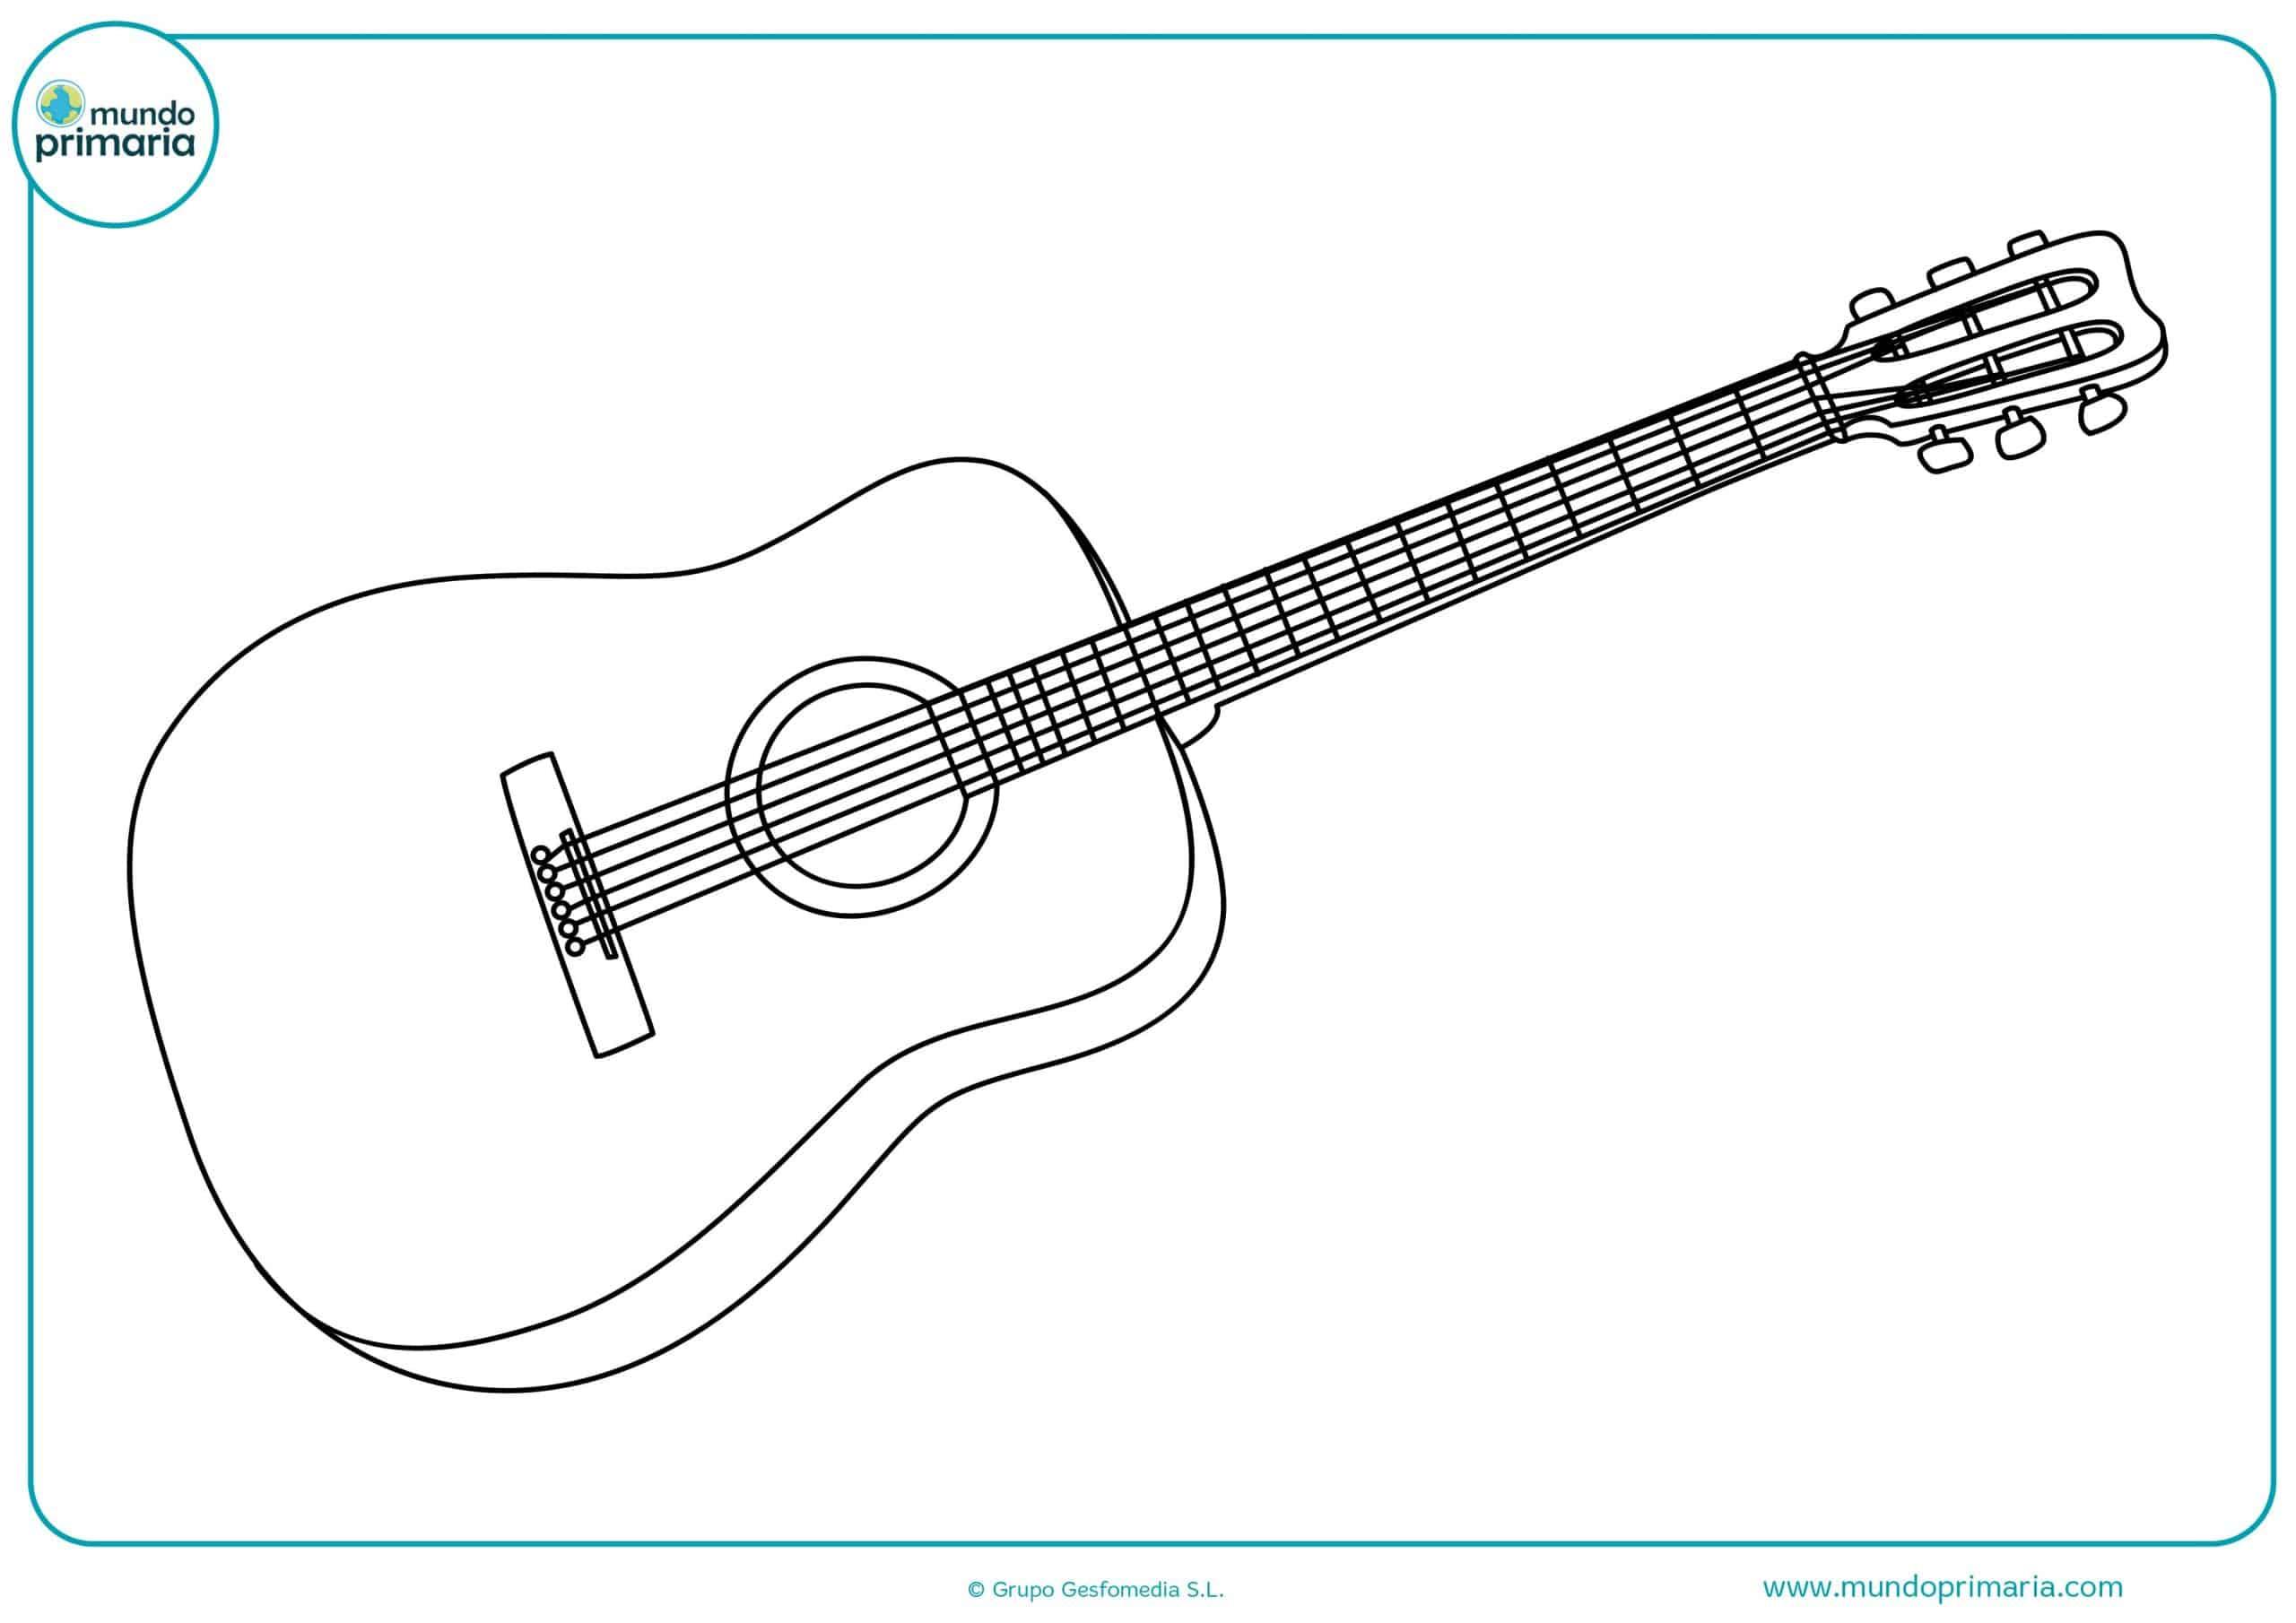 Dibujos de instrumentos musicales para dibujar